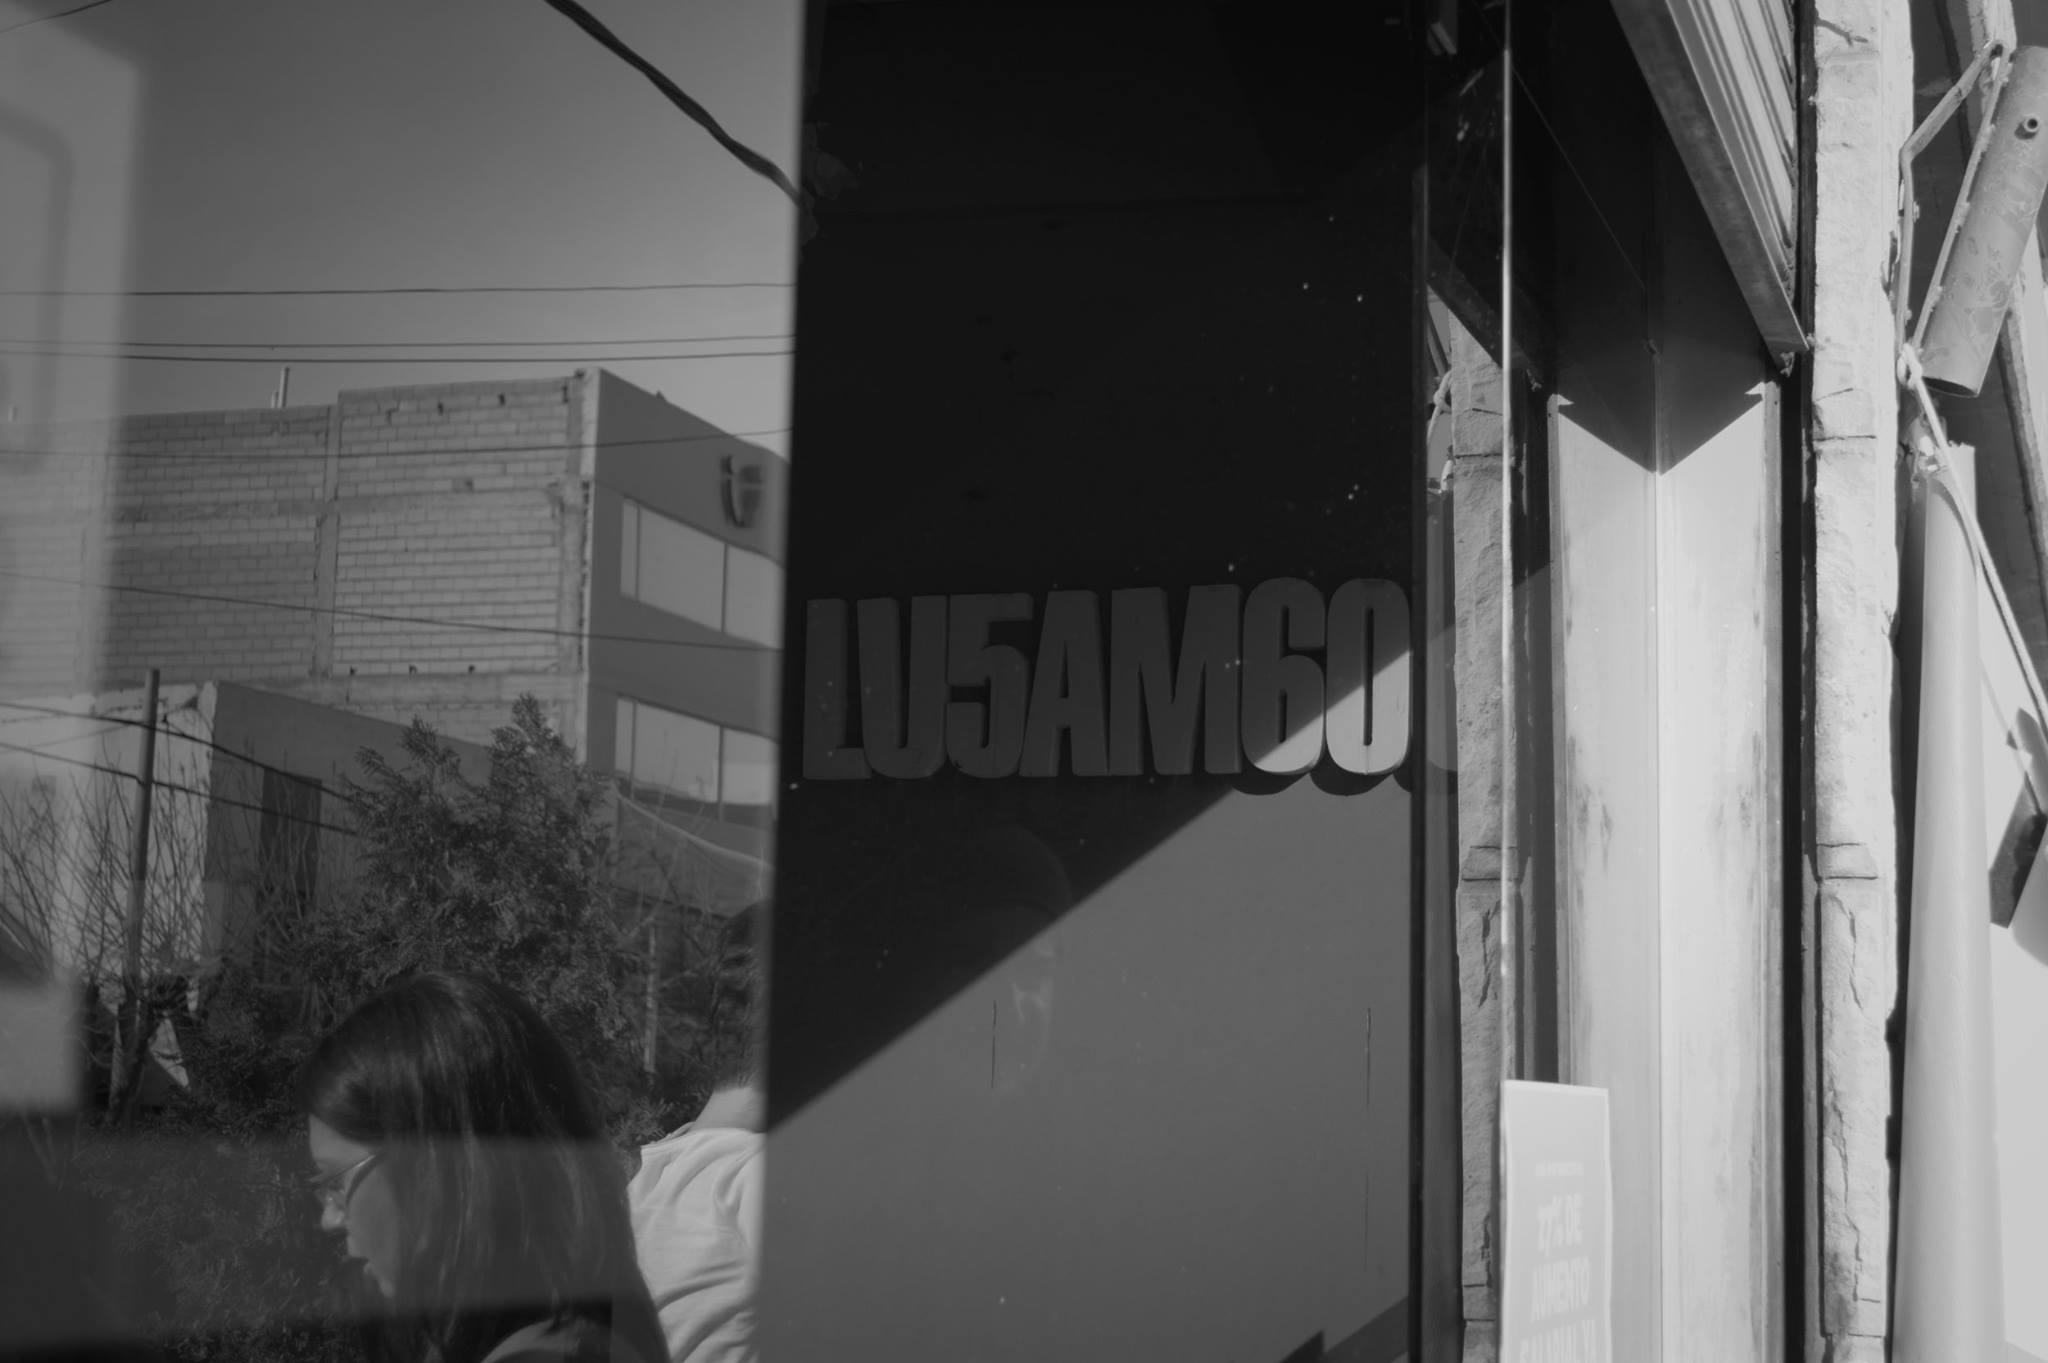 Radio LU5 de Neuquén